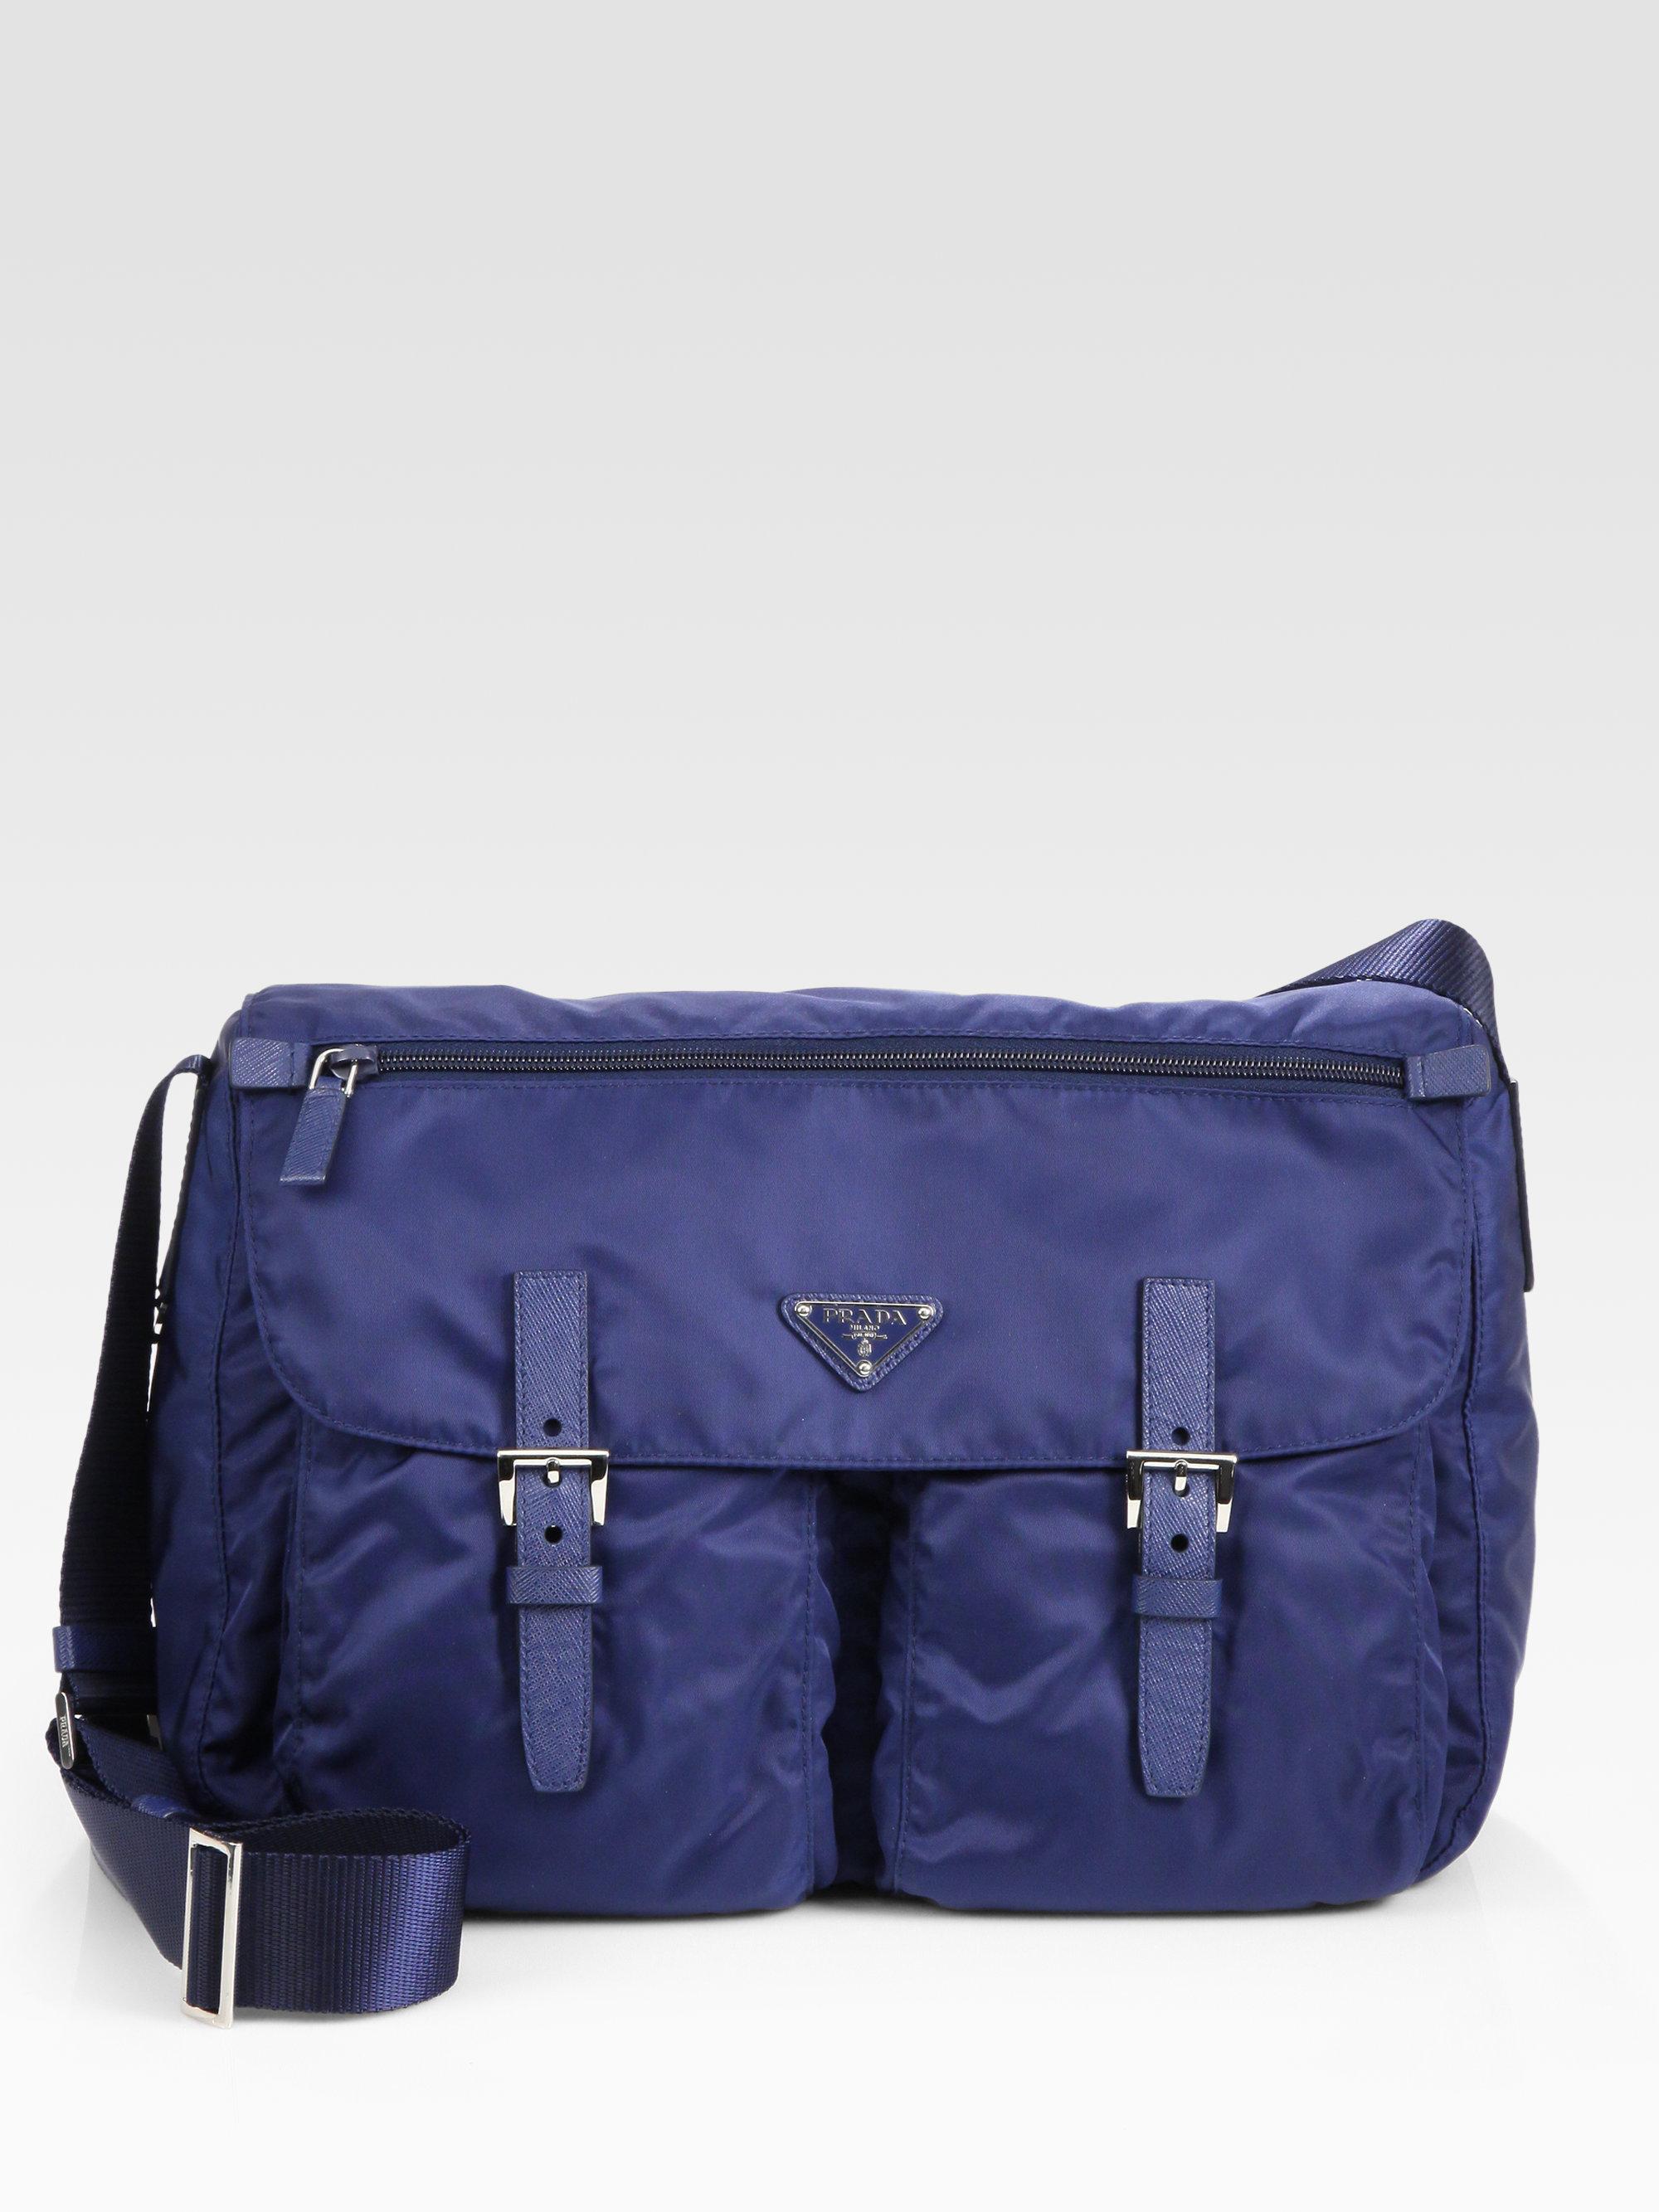 prada vela crossbody messenger bag